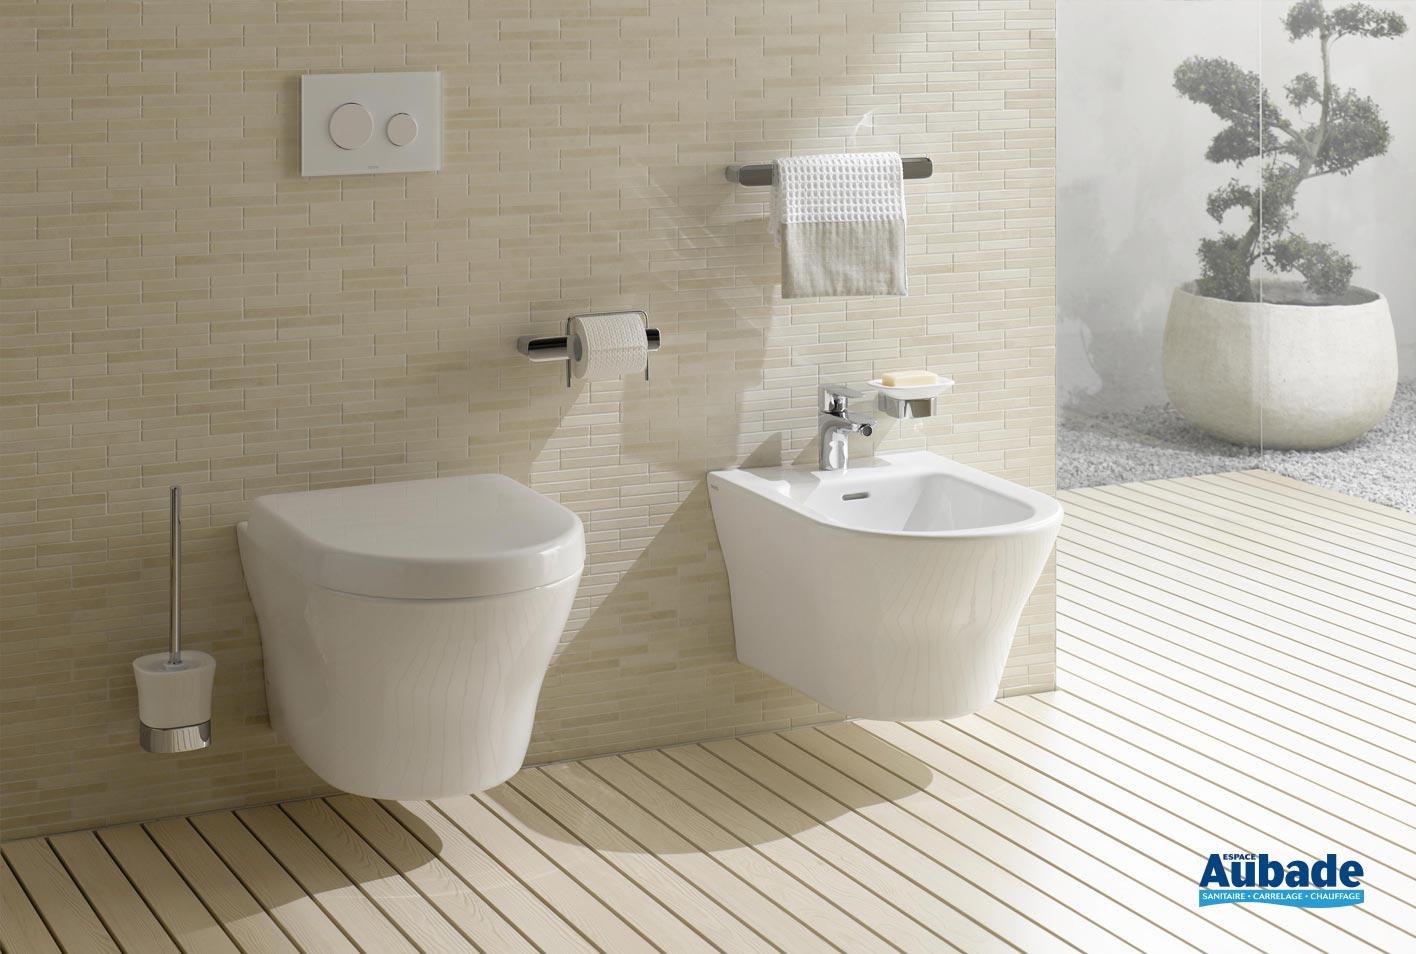 Marque De Toilette Suspendue wc cuvette suspendue mh toto | espace aubade